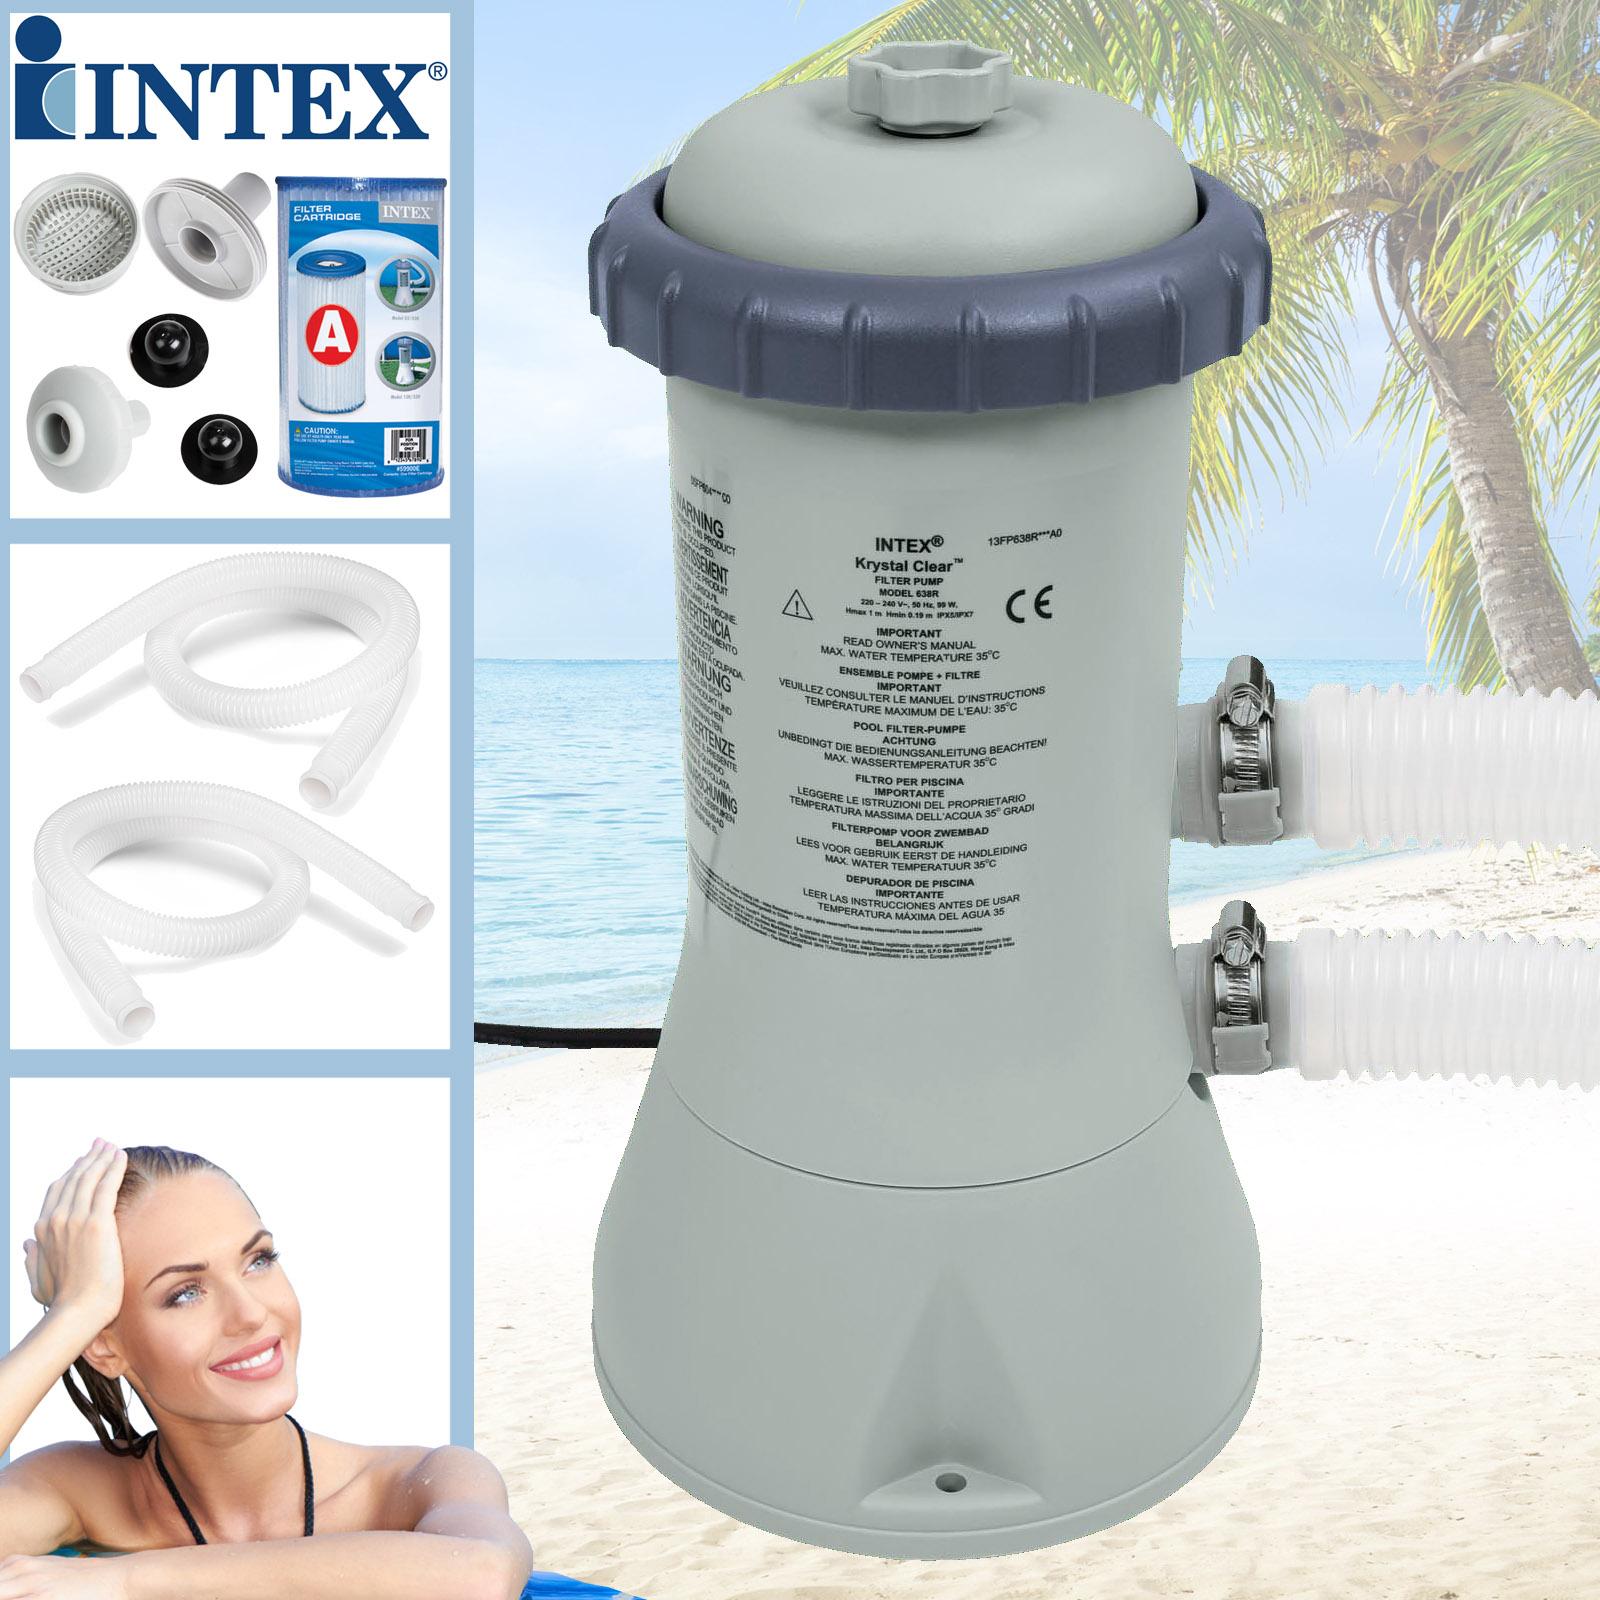 intex 2271 l h swimming pool pumpe filterpumpe poolpumpe. Black Bedroom Furniture Sets. Home Design Ideas